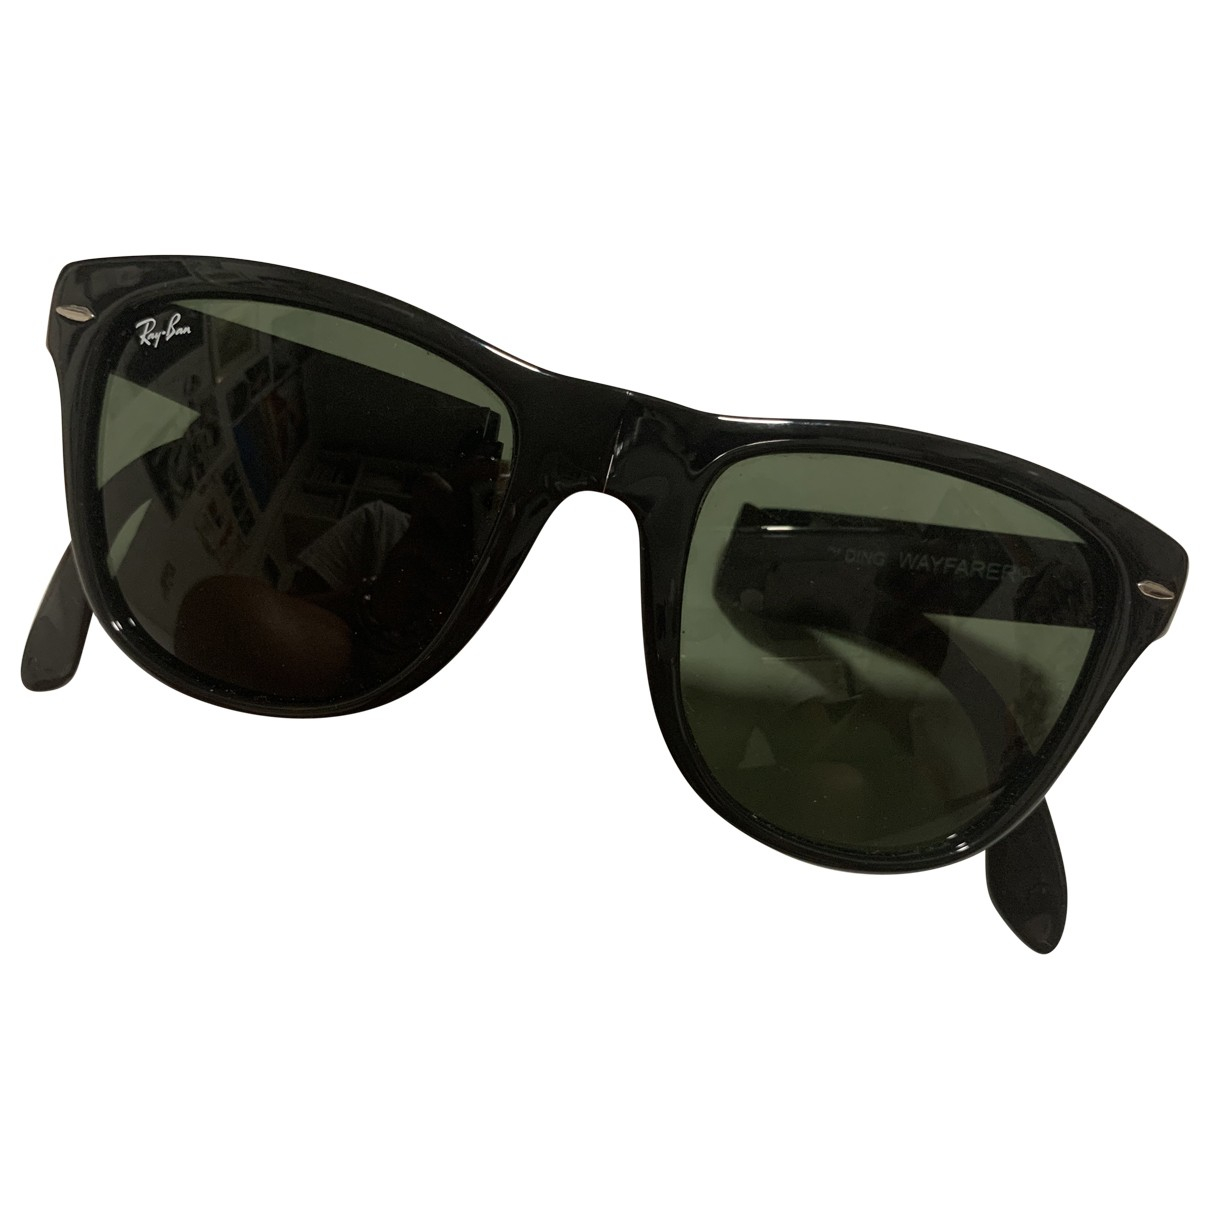 Gafas Original Wayfarer Ray-ban